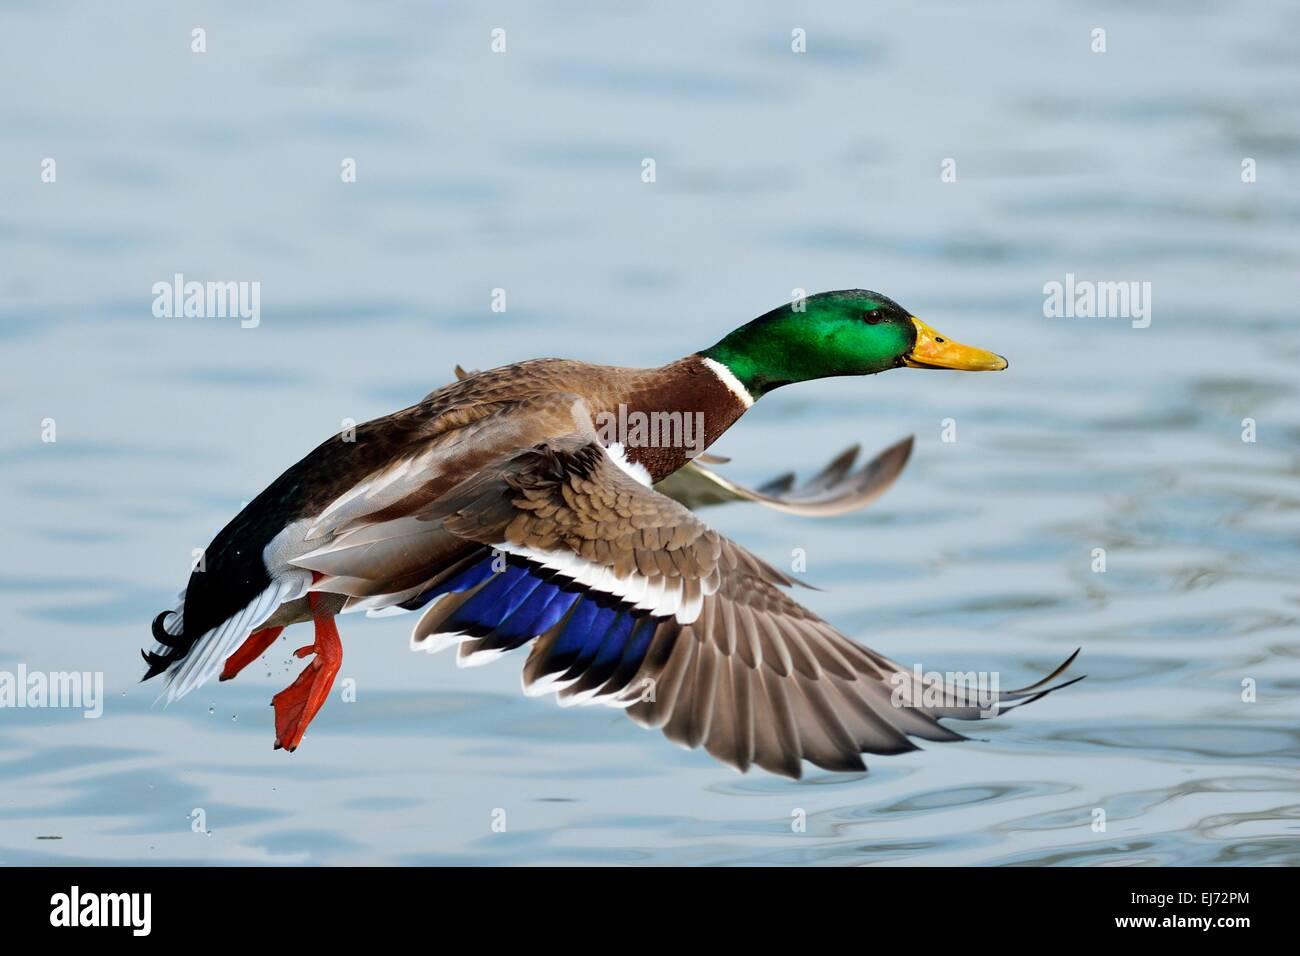 Mallard (Anas platyrhynchos) male in flight, Zugerseee, Switzerland - Stock Image